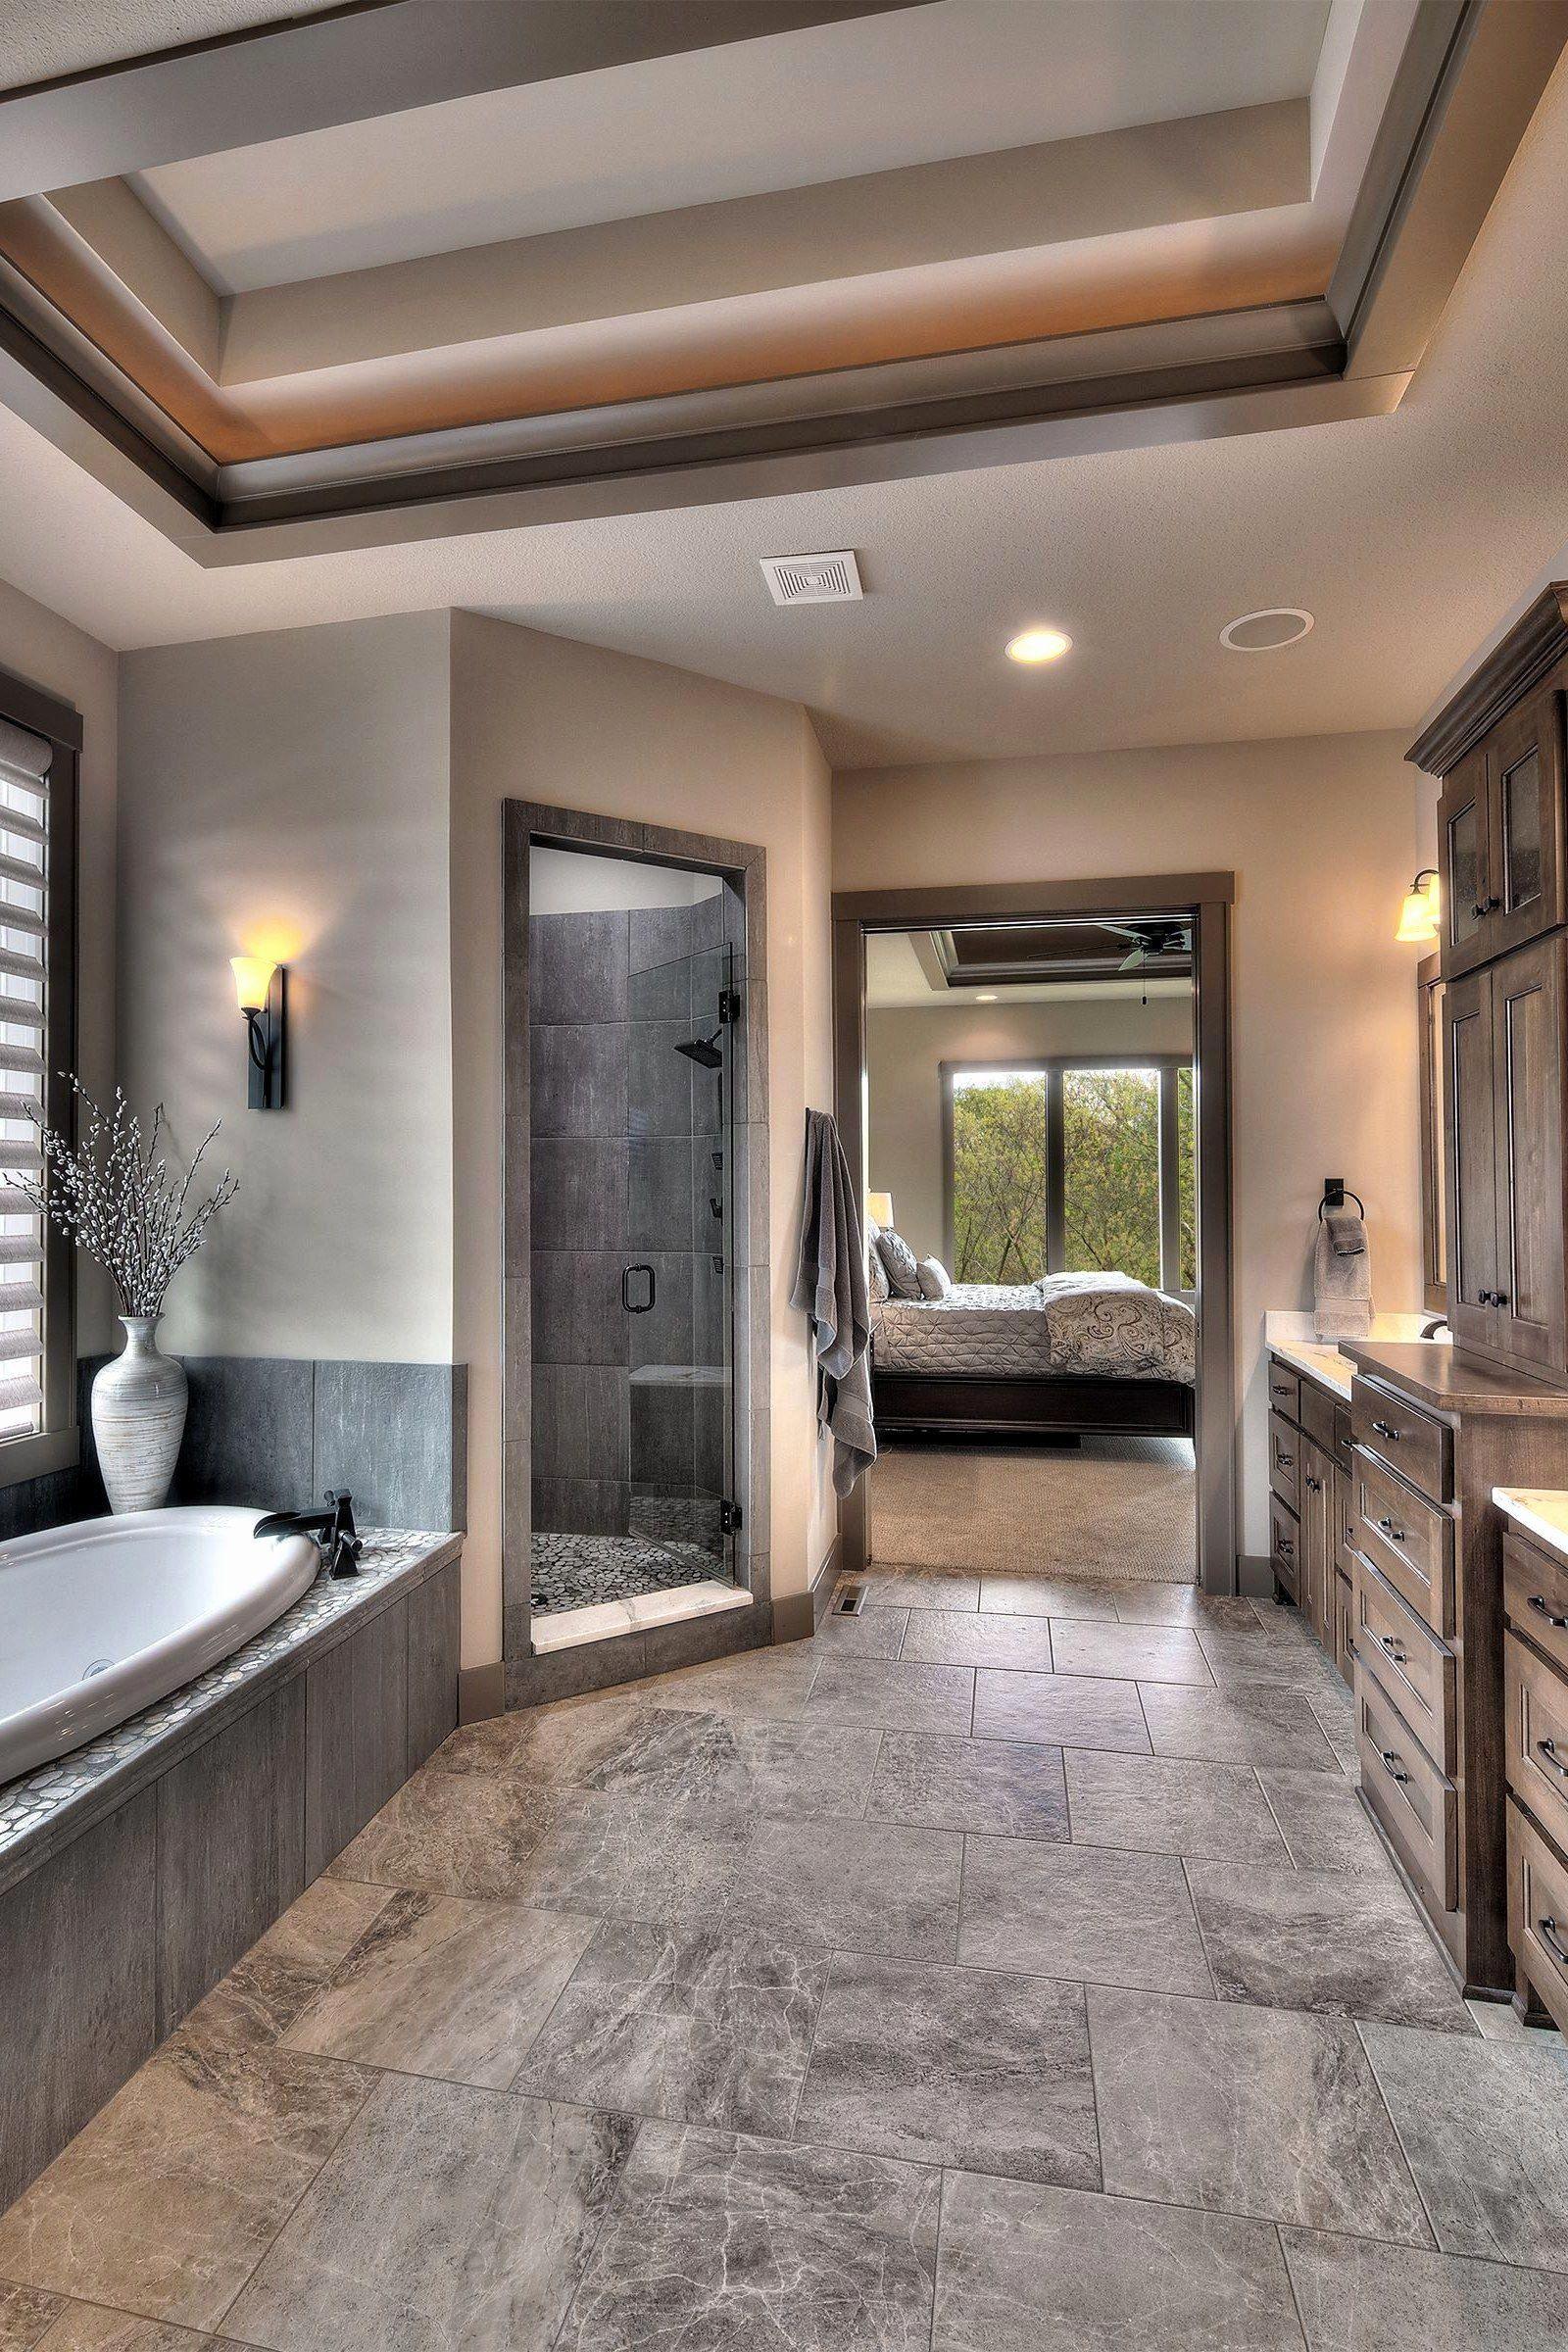 Master Bedroom Bathroom Ideas Lovely Bathroom Wall Decor Ideas Classy Bathroom Decor In 2020 Bathroom Design Dream Bathrooms Justice Design